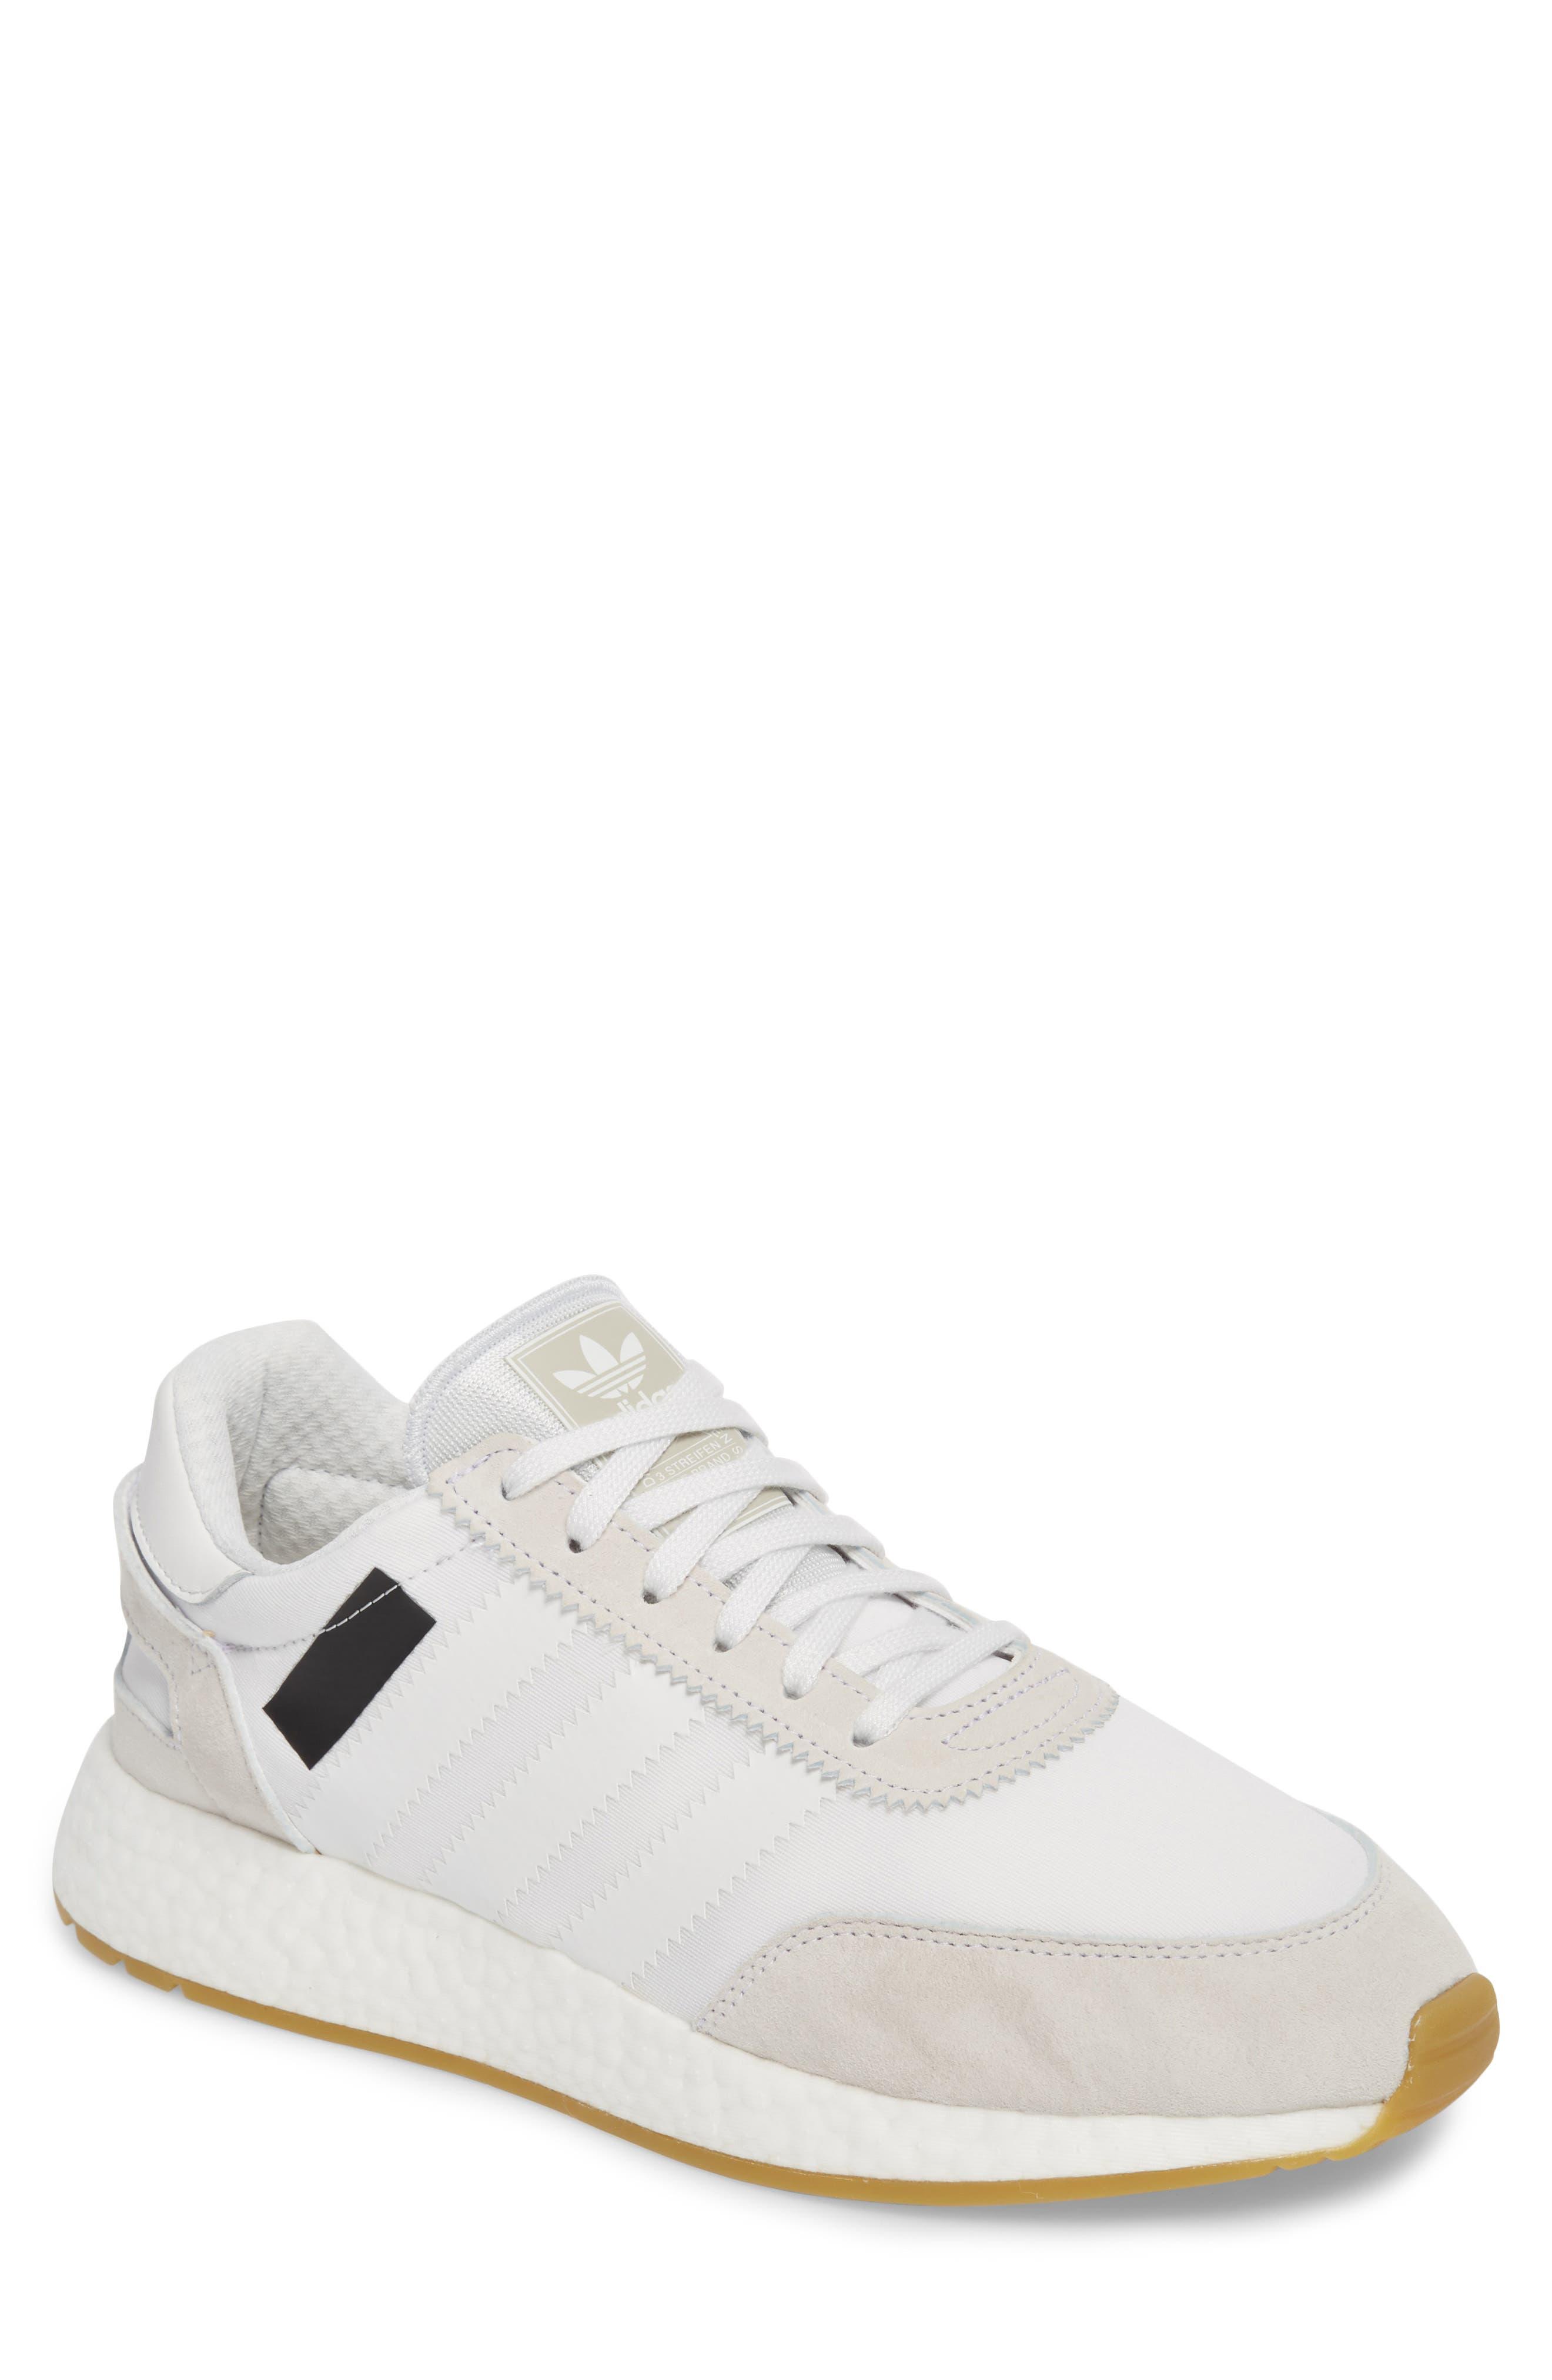 I-5923 Sneaker,                             Main thumbnail 1, color,                             Crystal White/ White